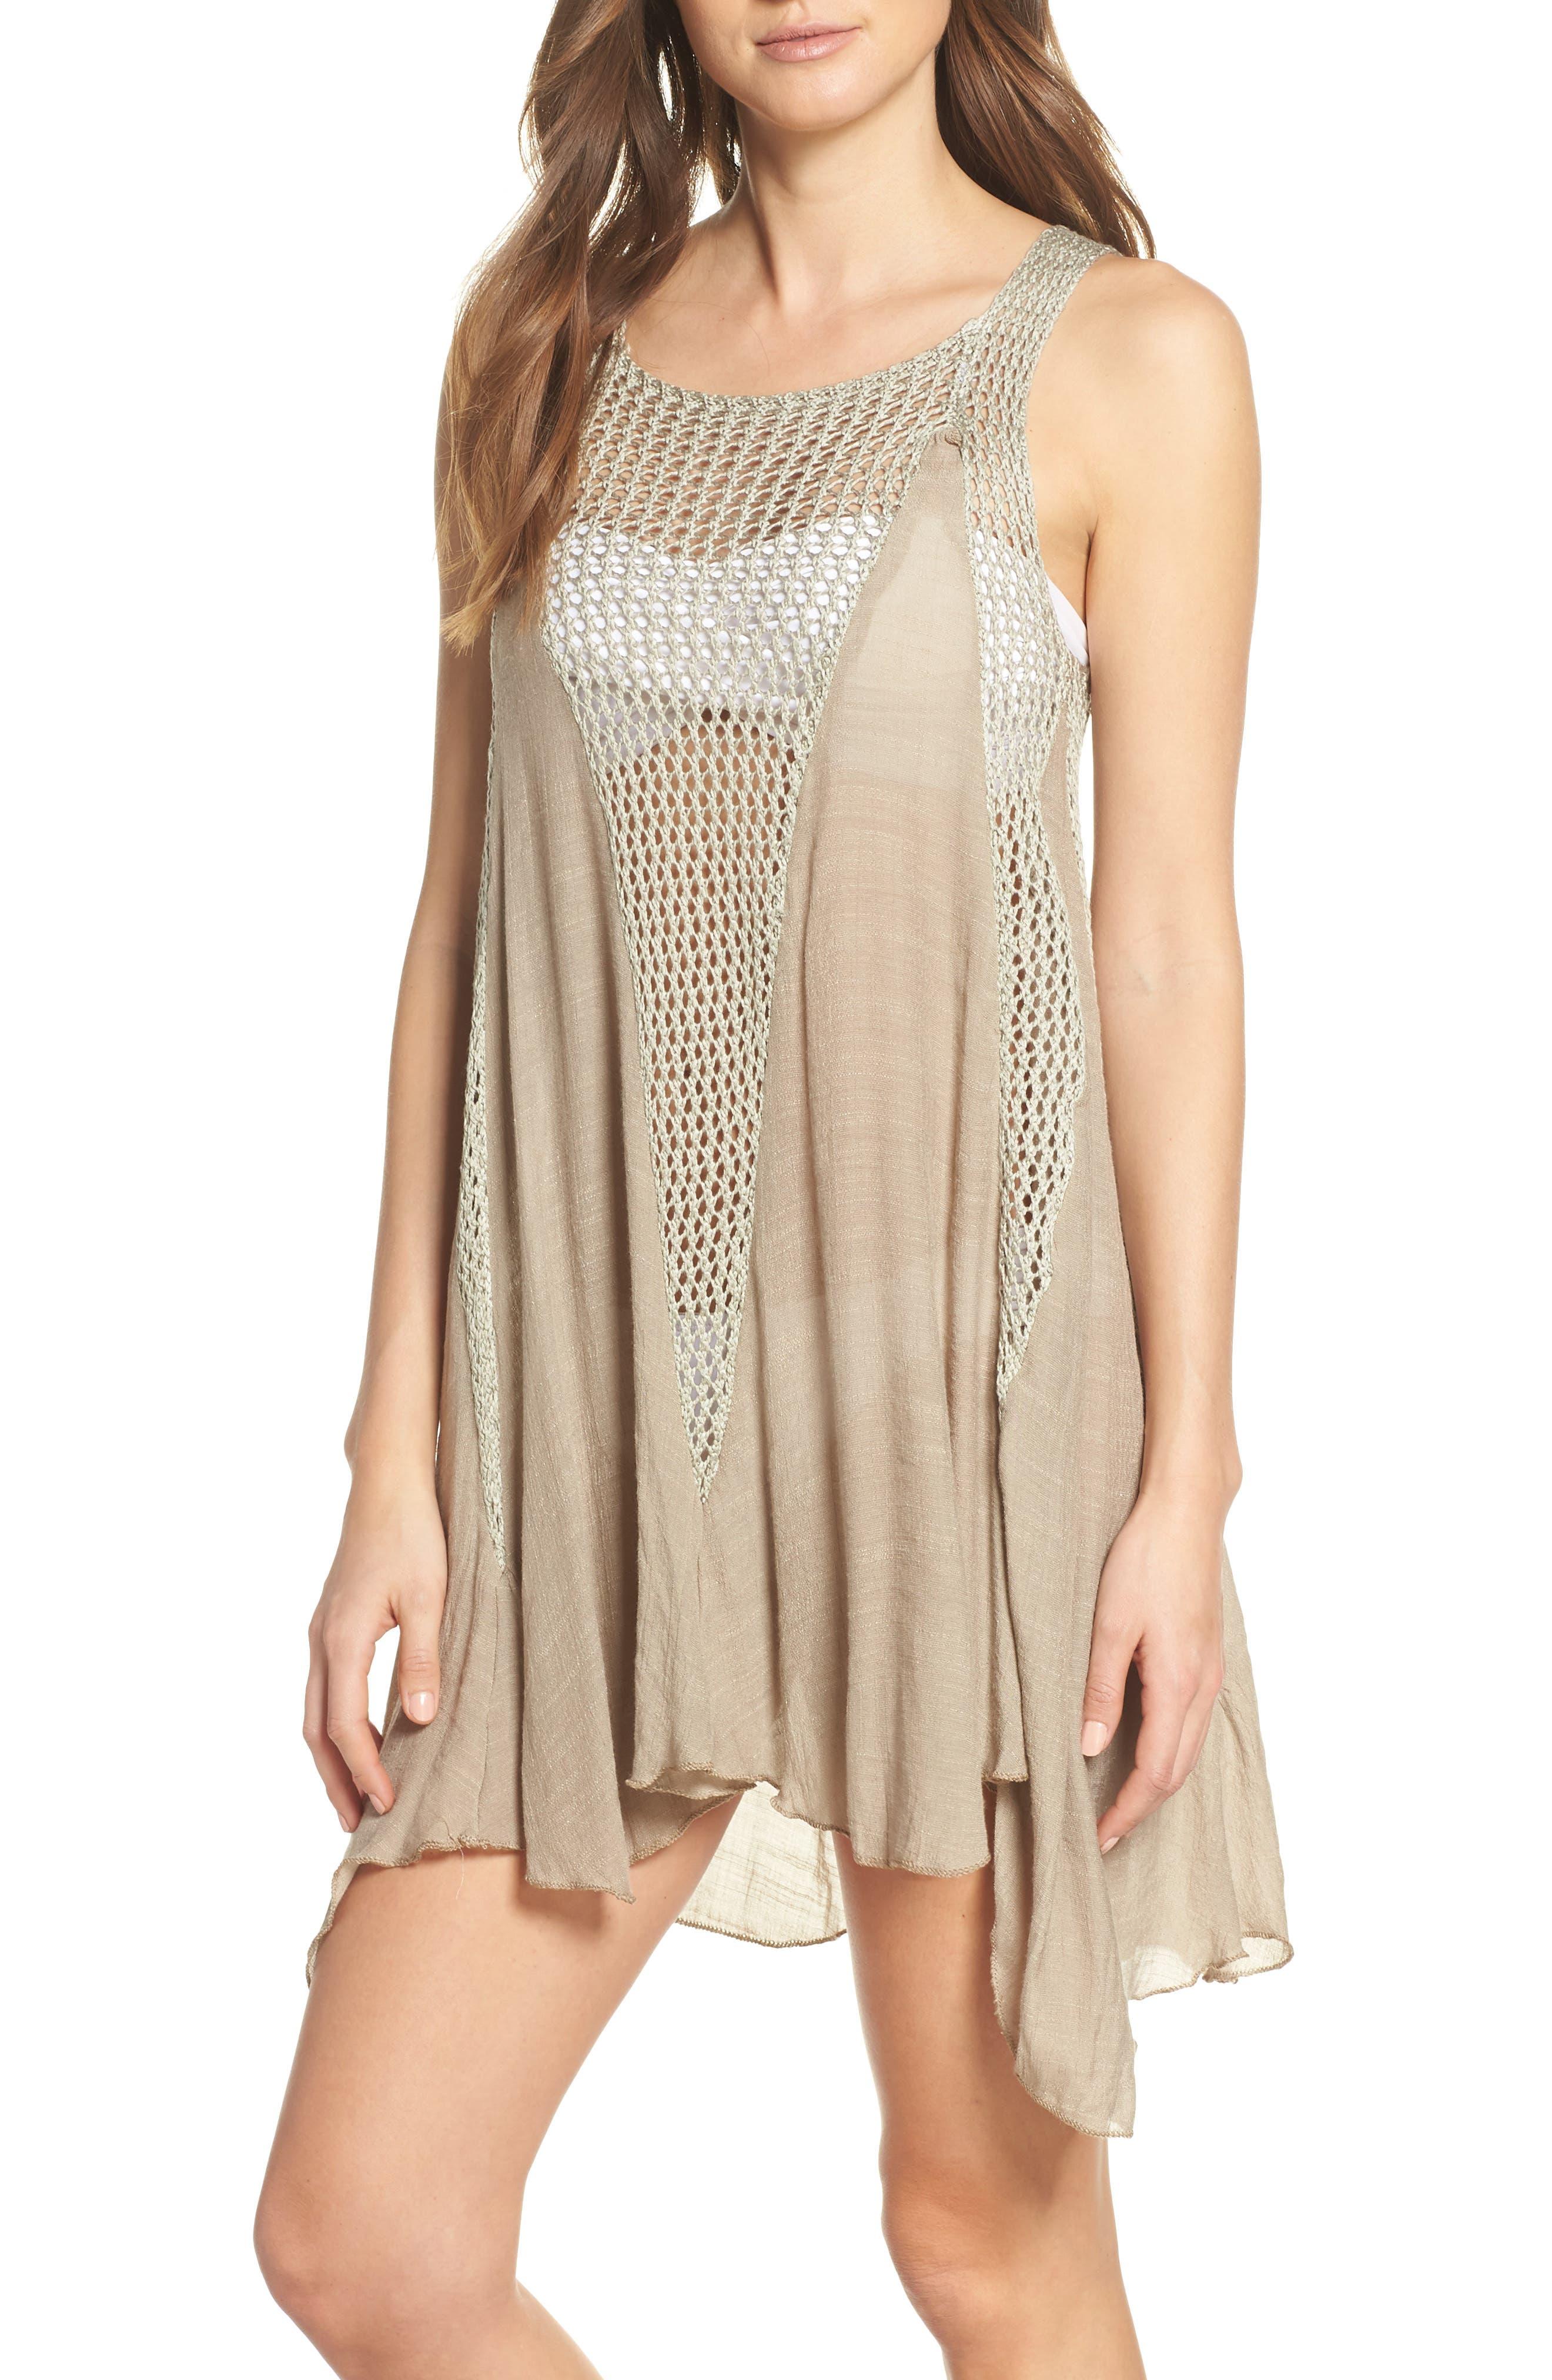 ELAN, Crochet Inset Cover-Up Dress, Main thumbnail 1, color, SAGE